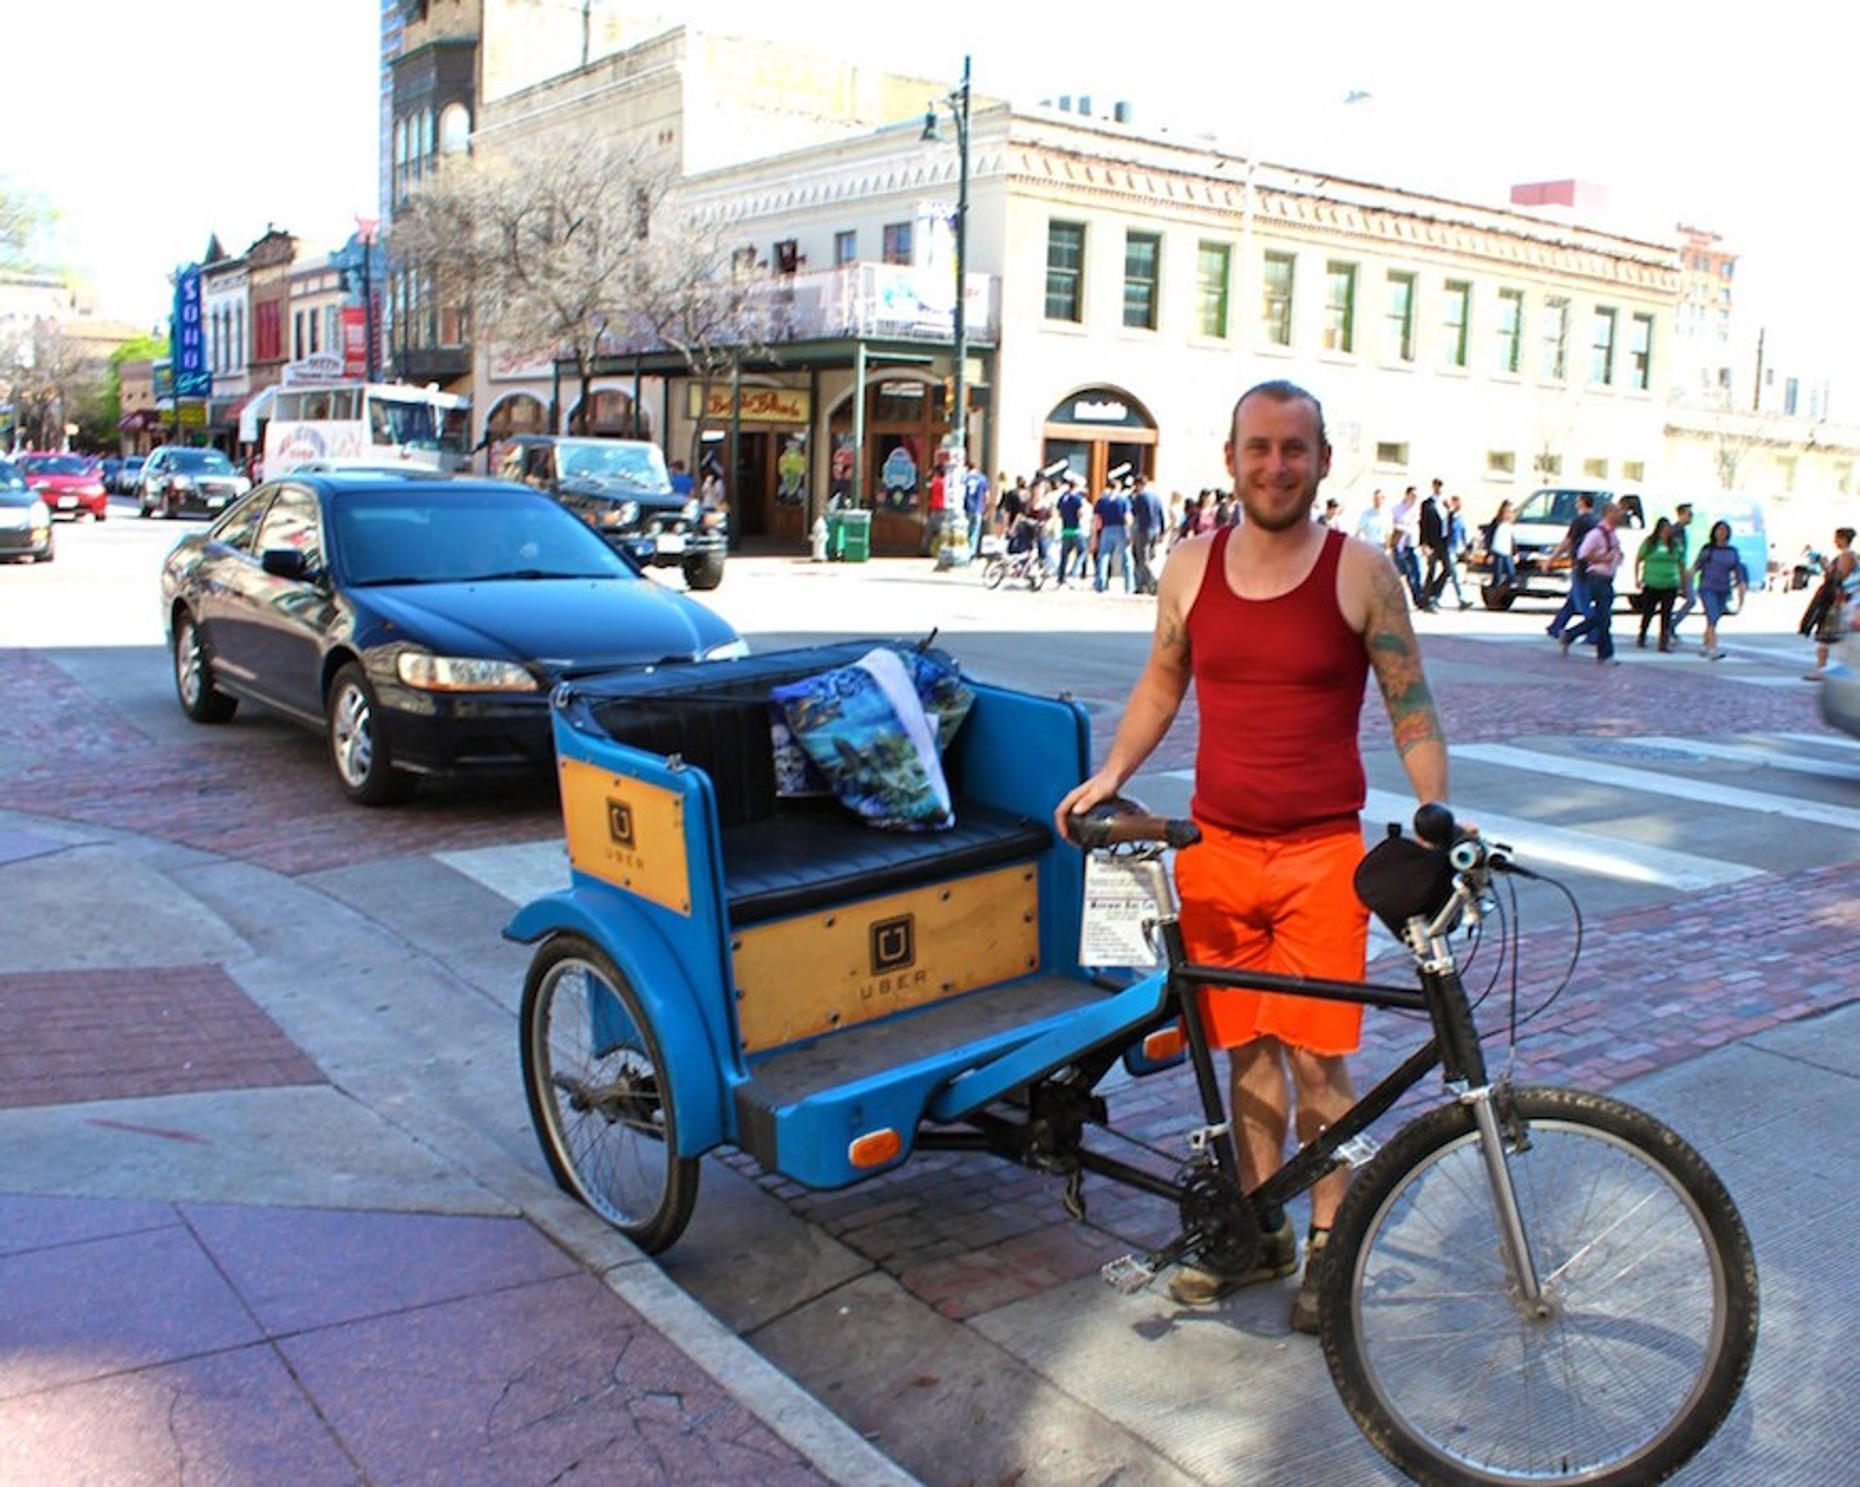 Downtown Pedicab Tour of Austin